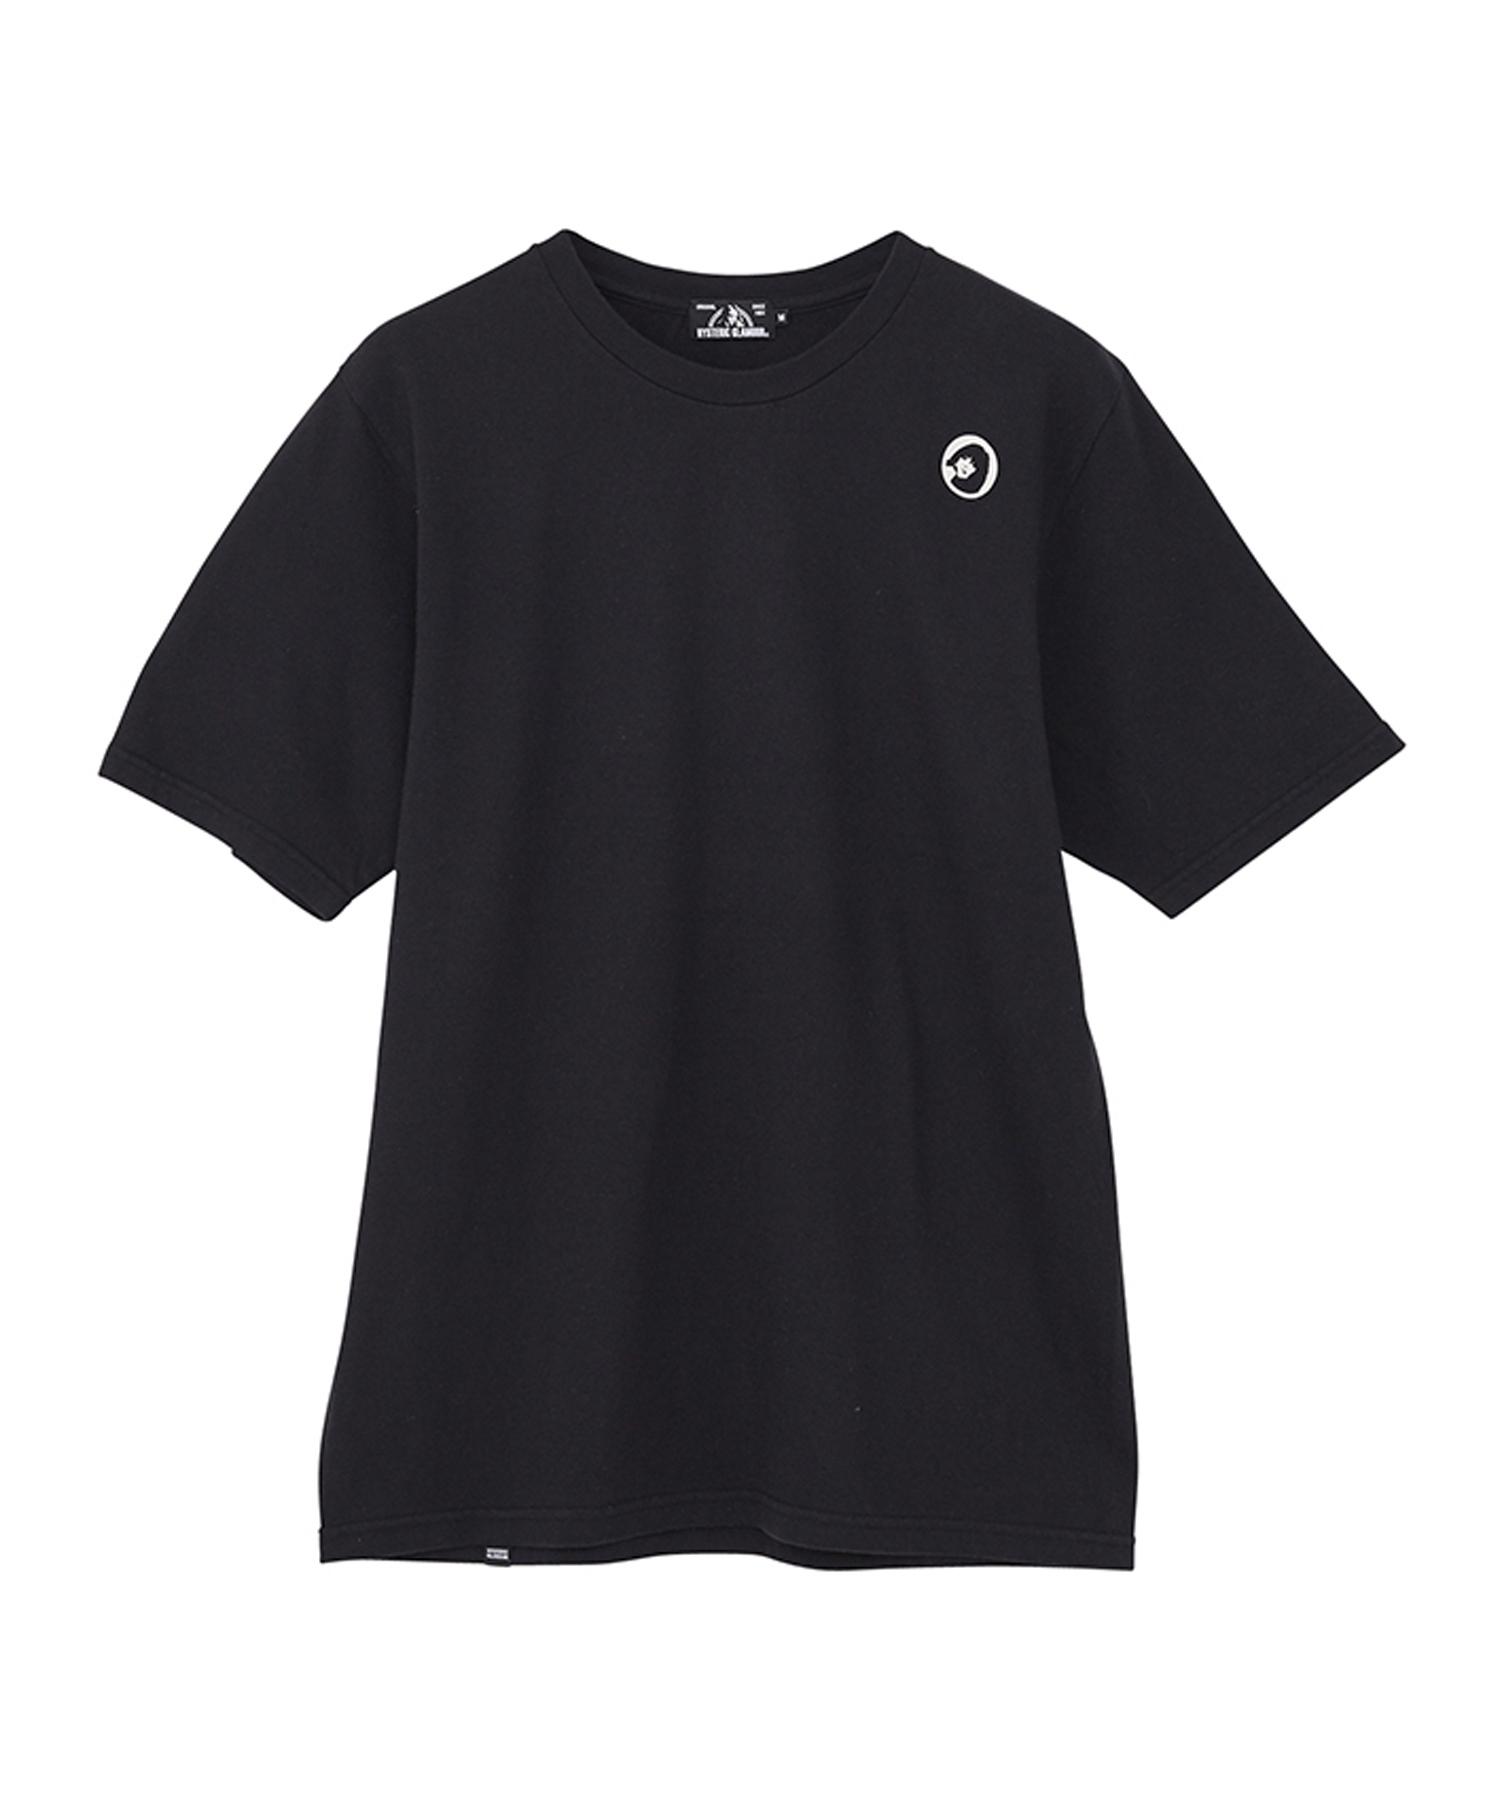 HYS SOUNDS SCRATCH Tシャツ